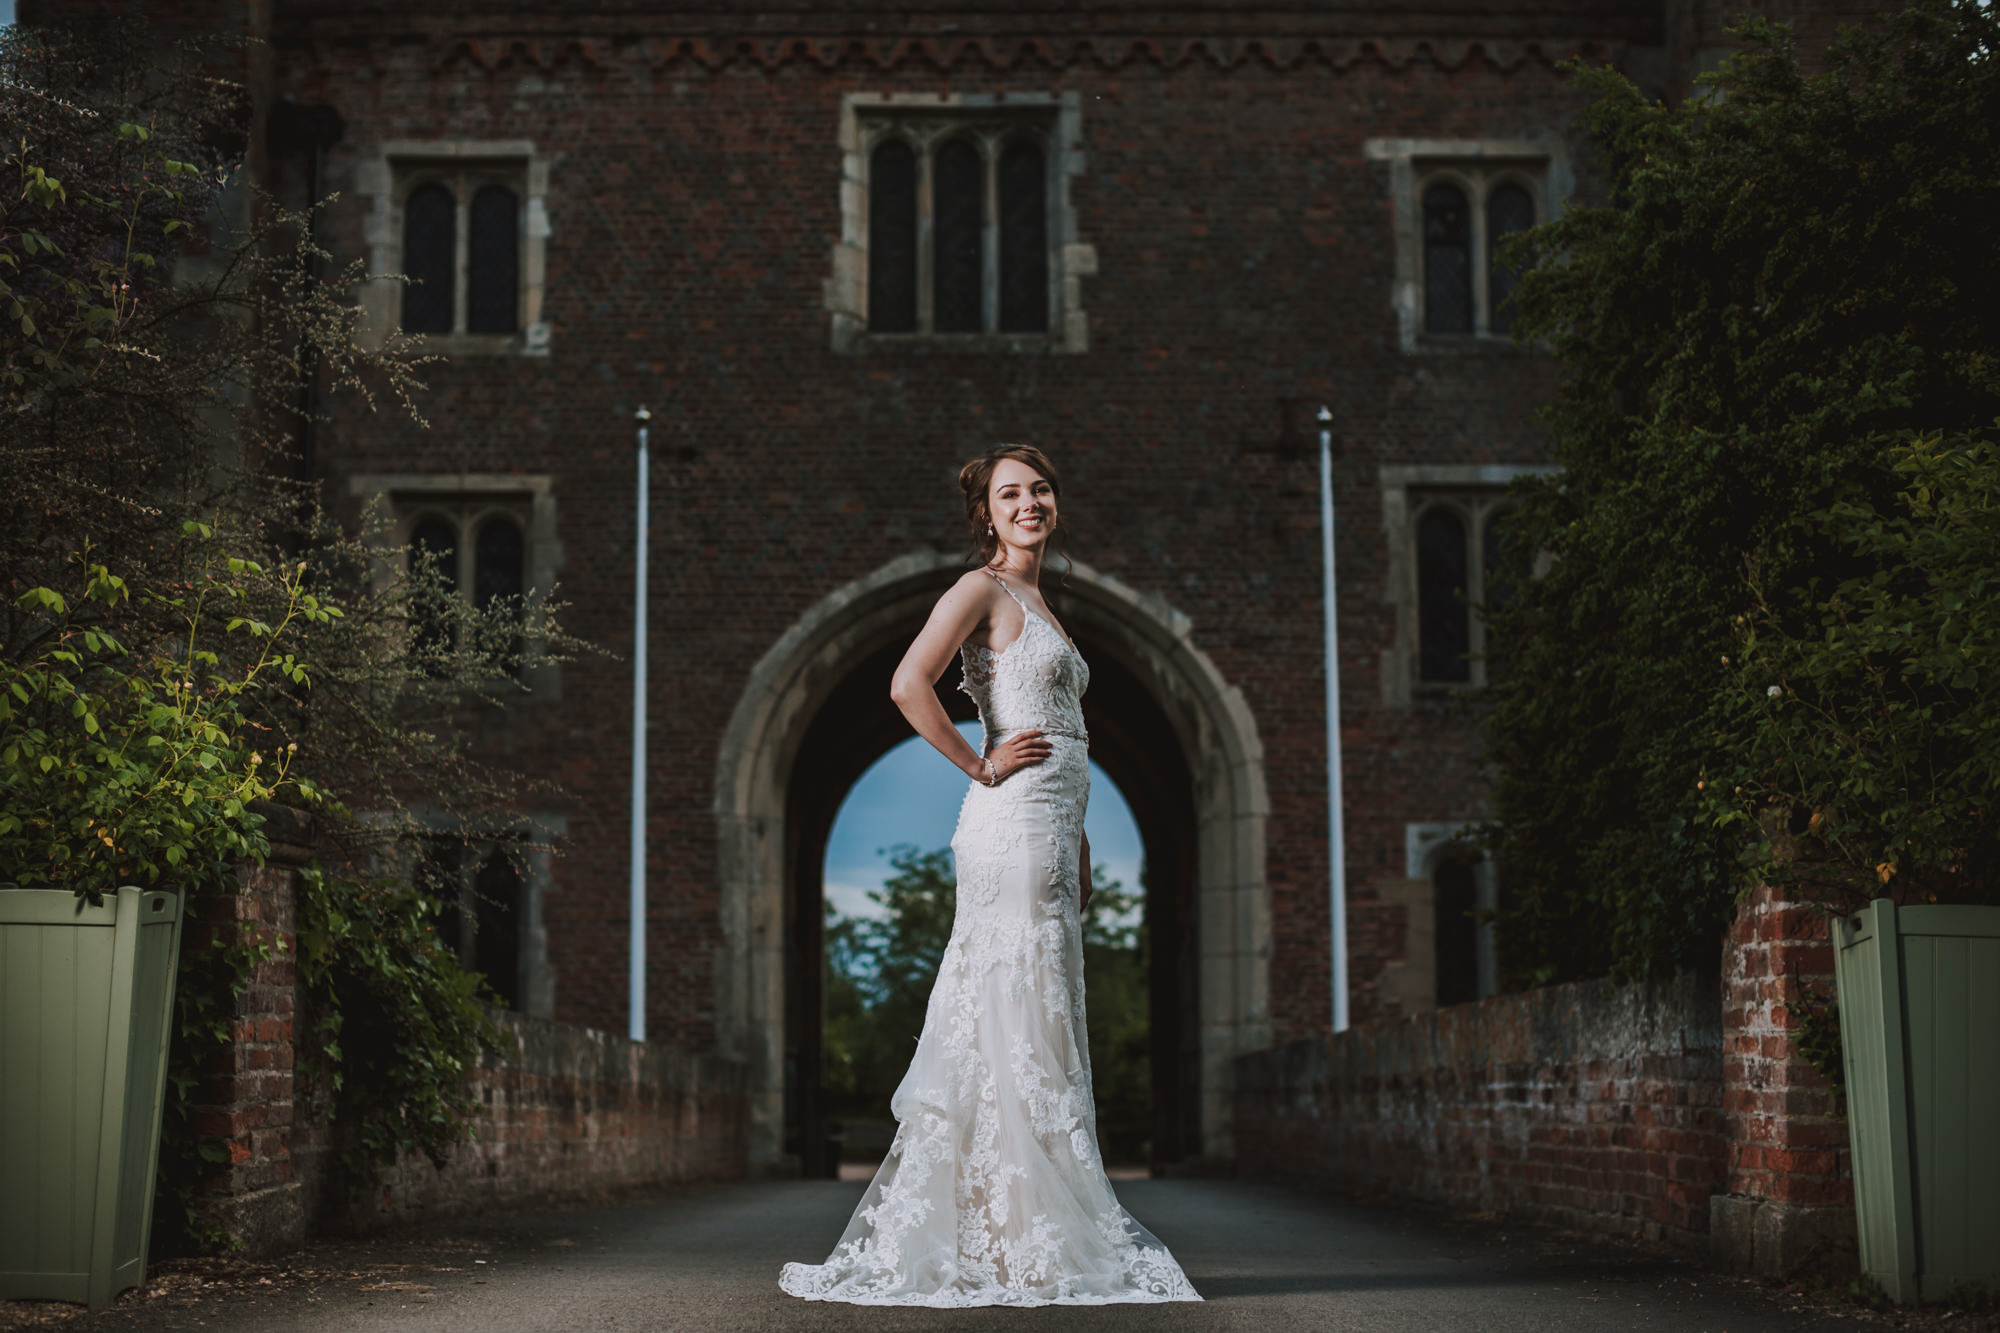 hodsock priory wedding photographers blog89.jpg